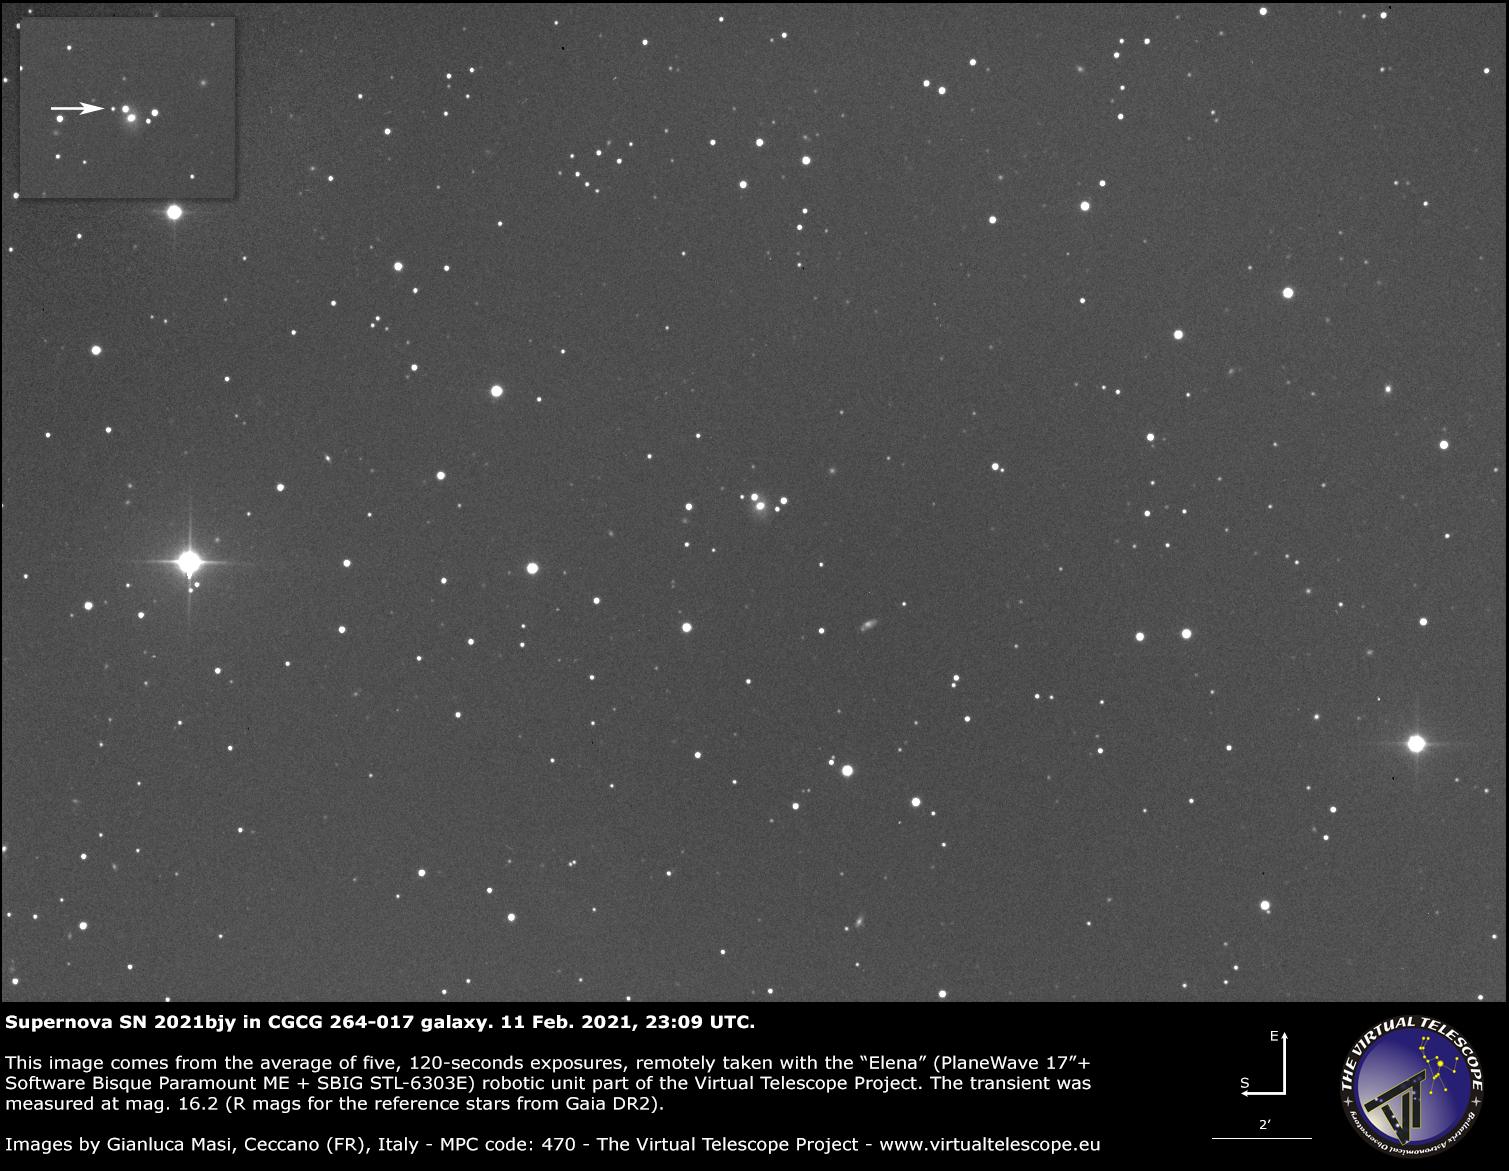 Supernova SN 2021bjy in CGCG 264-017 galaxy: 11 Feb. 2021.